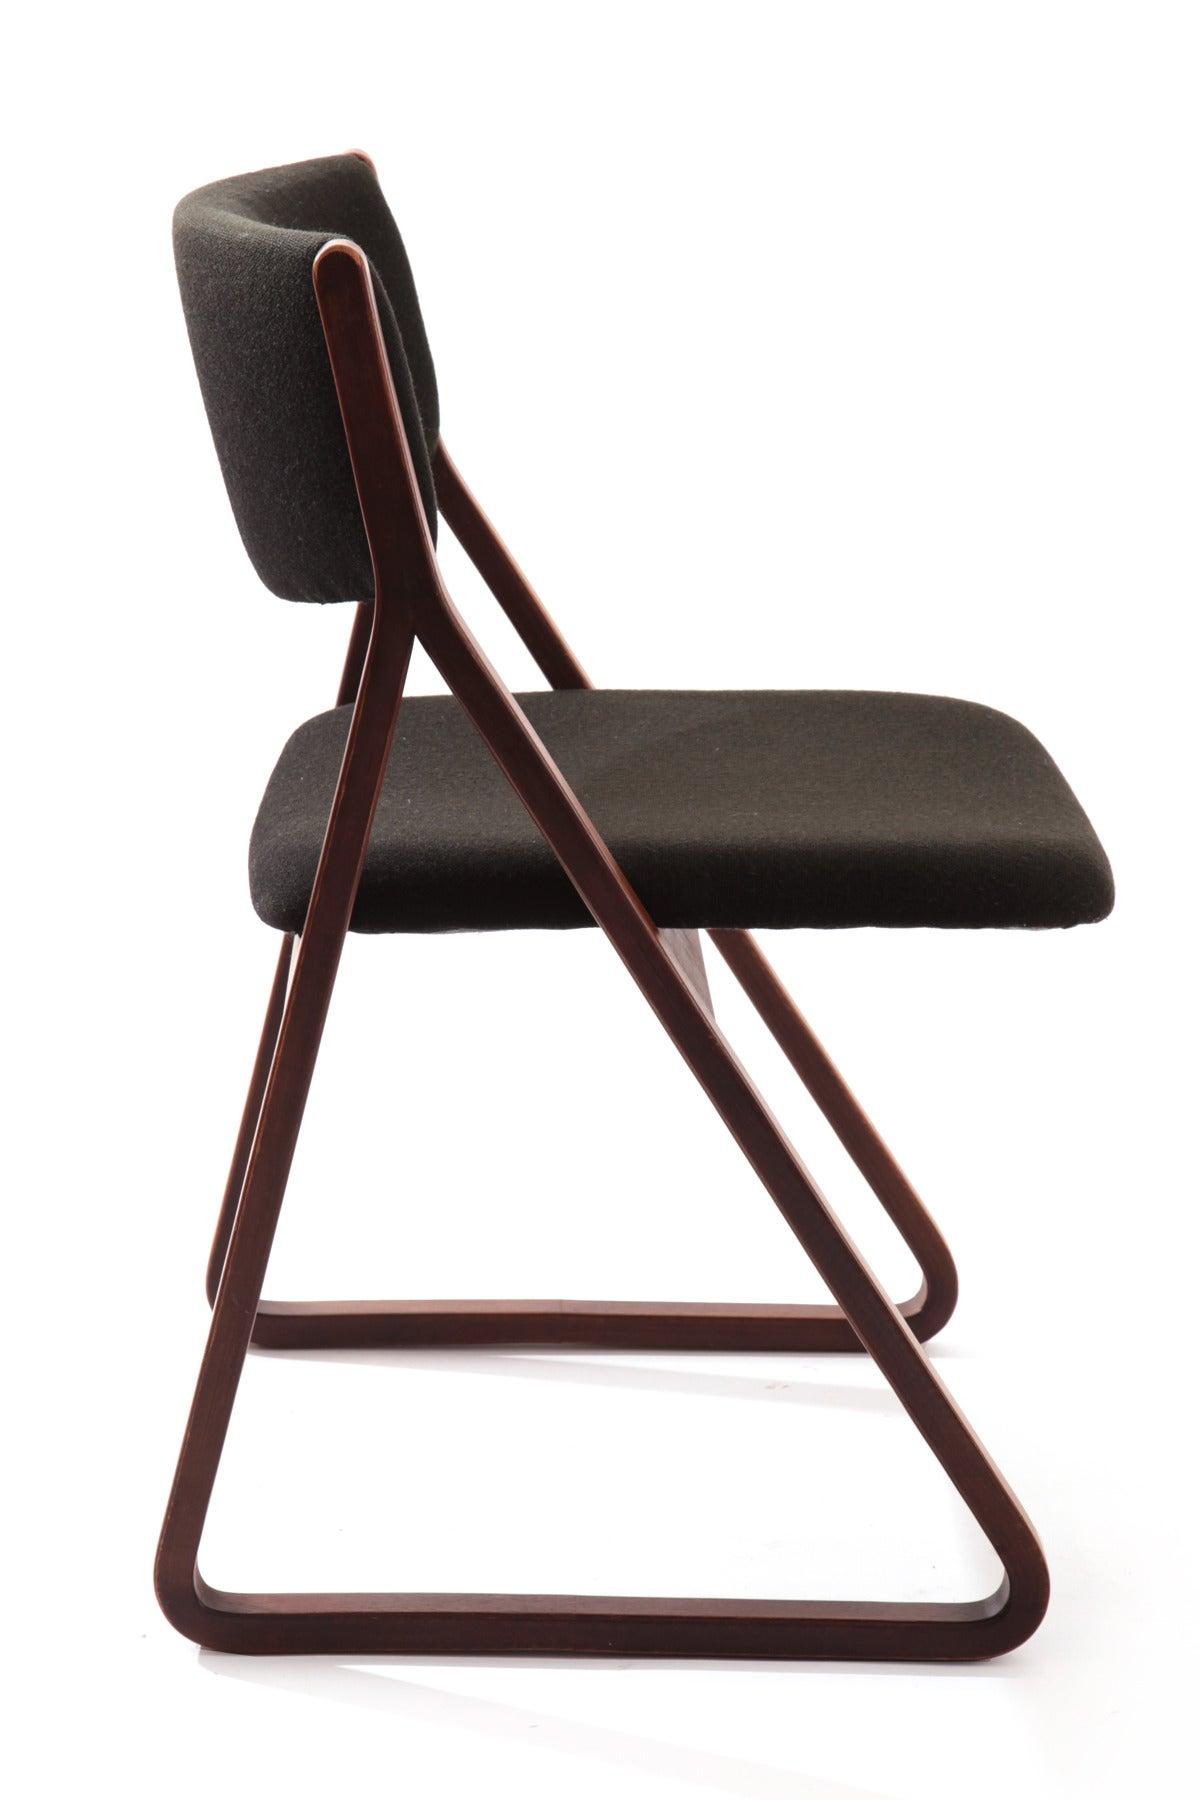 Edward wormley for dunbar occasional chair at 1stdibs - Edward wormley chairs ...